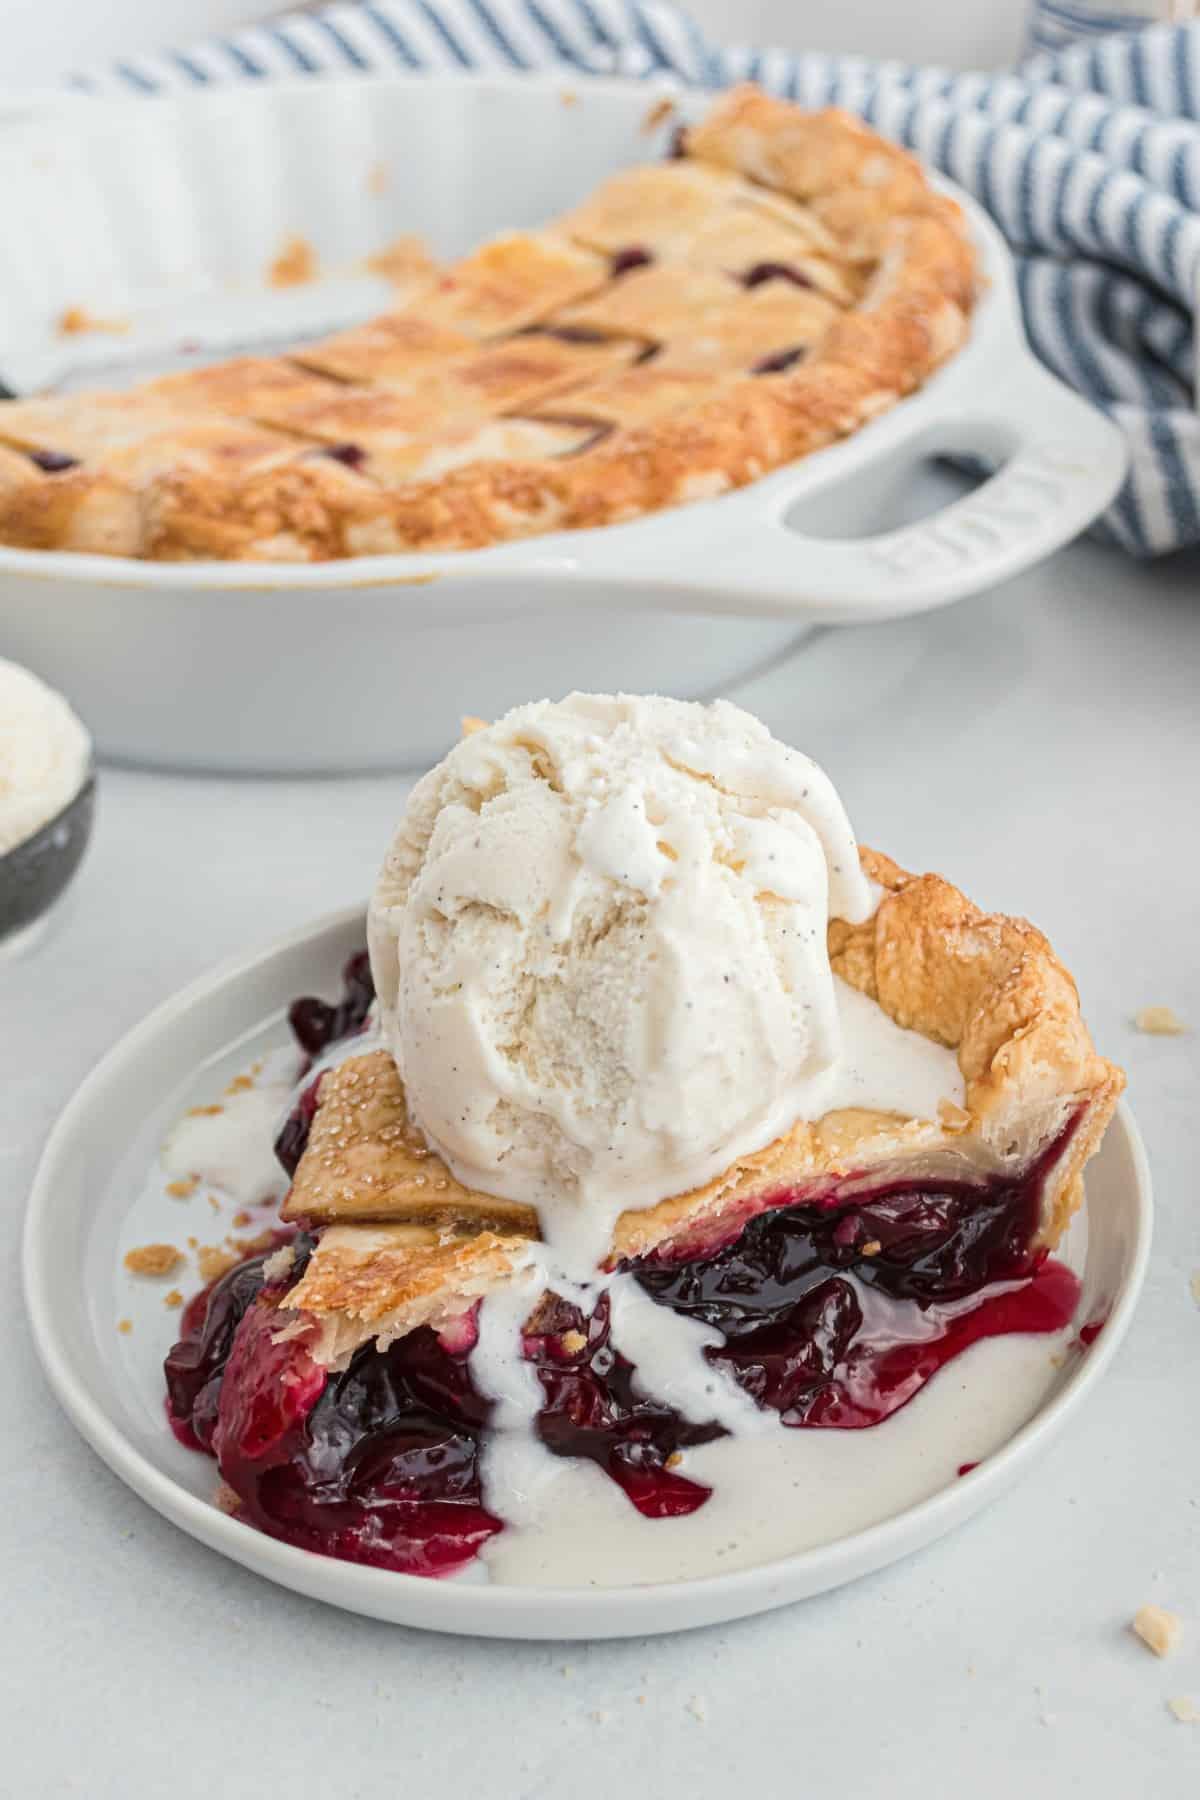 Slice of cherry pie with a scoop of vanilla ice cream melting on top.